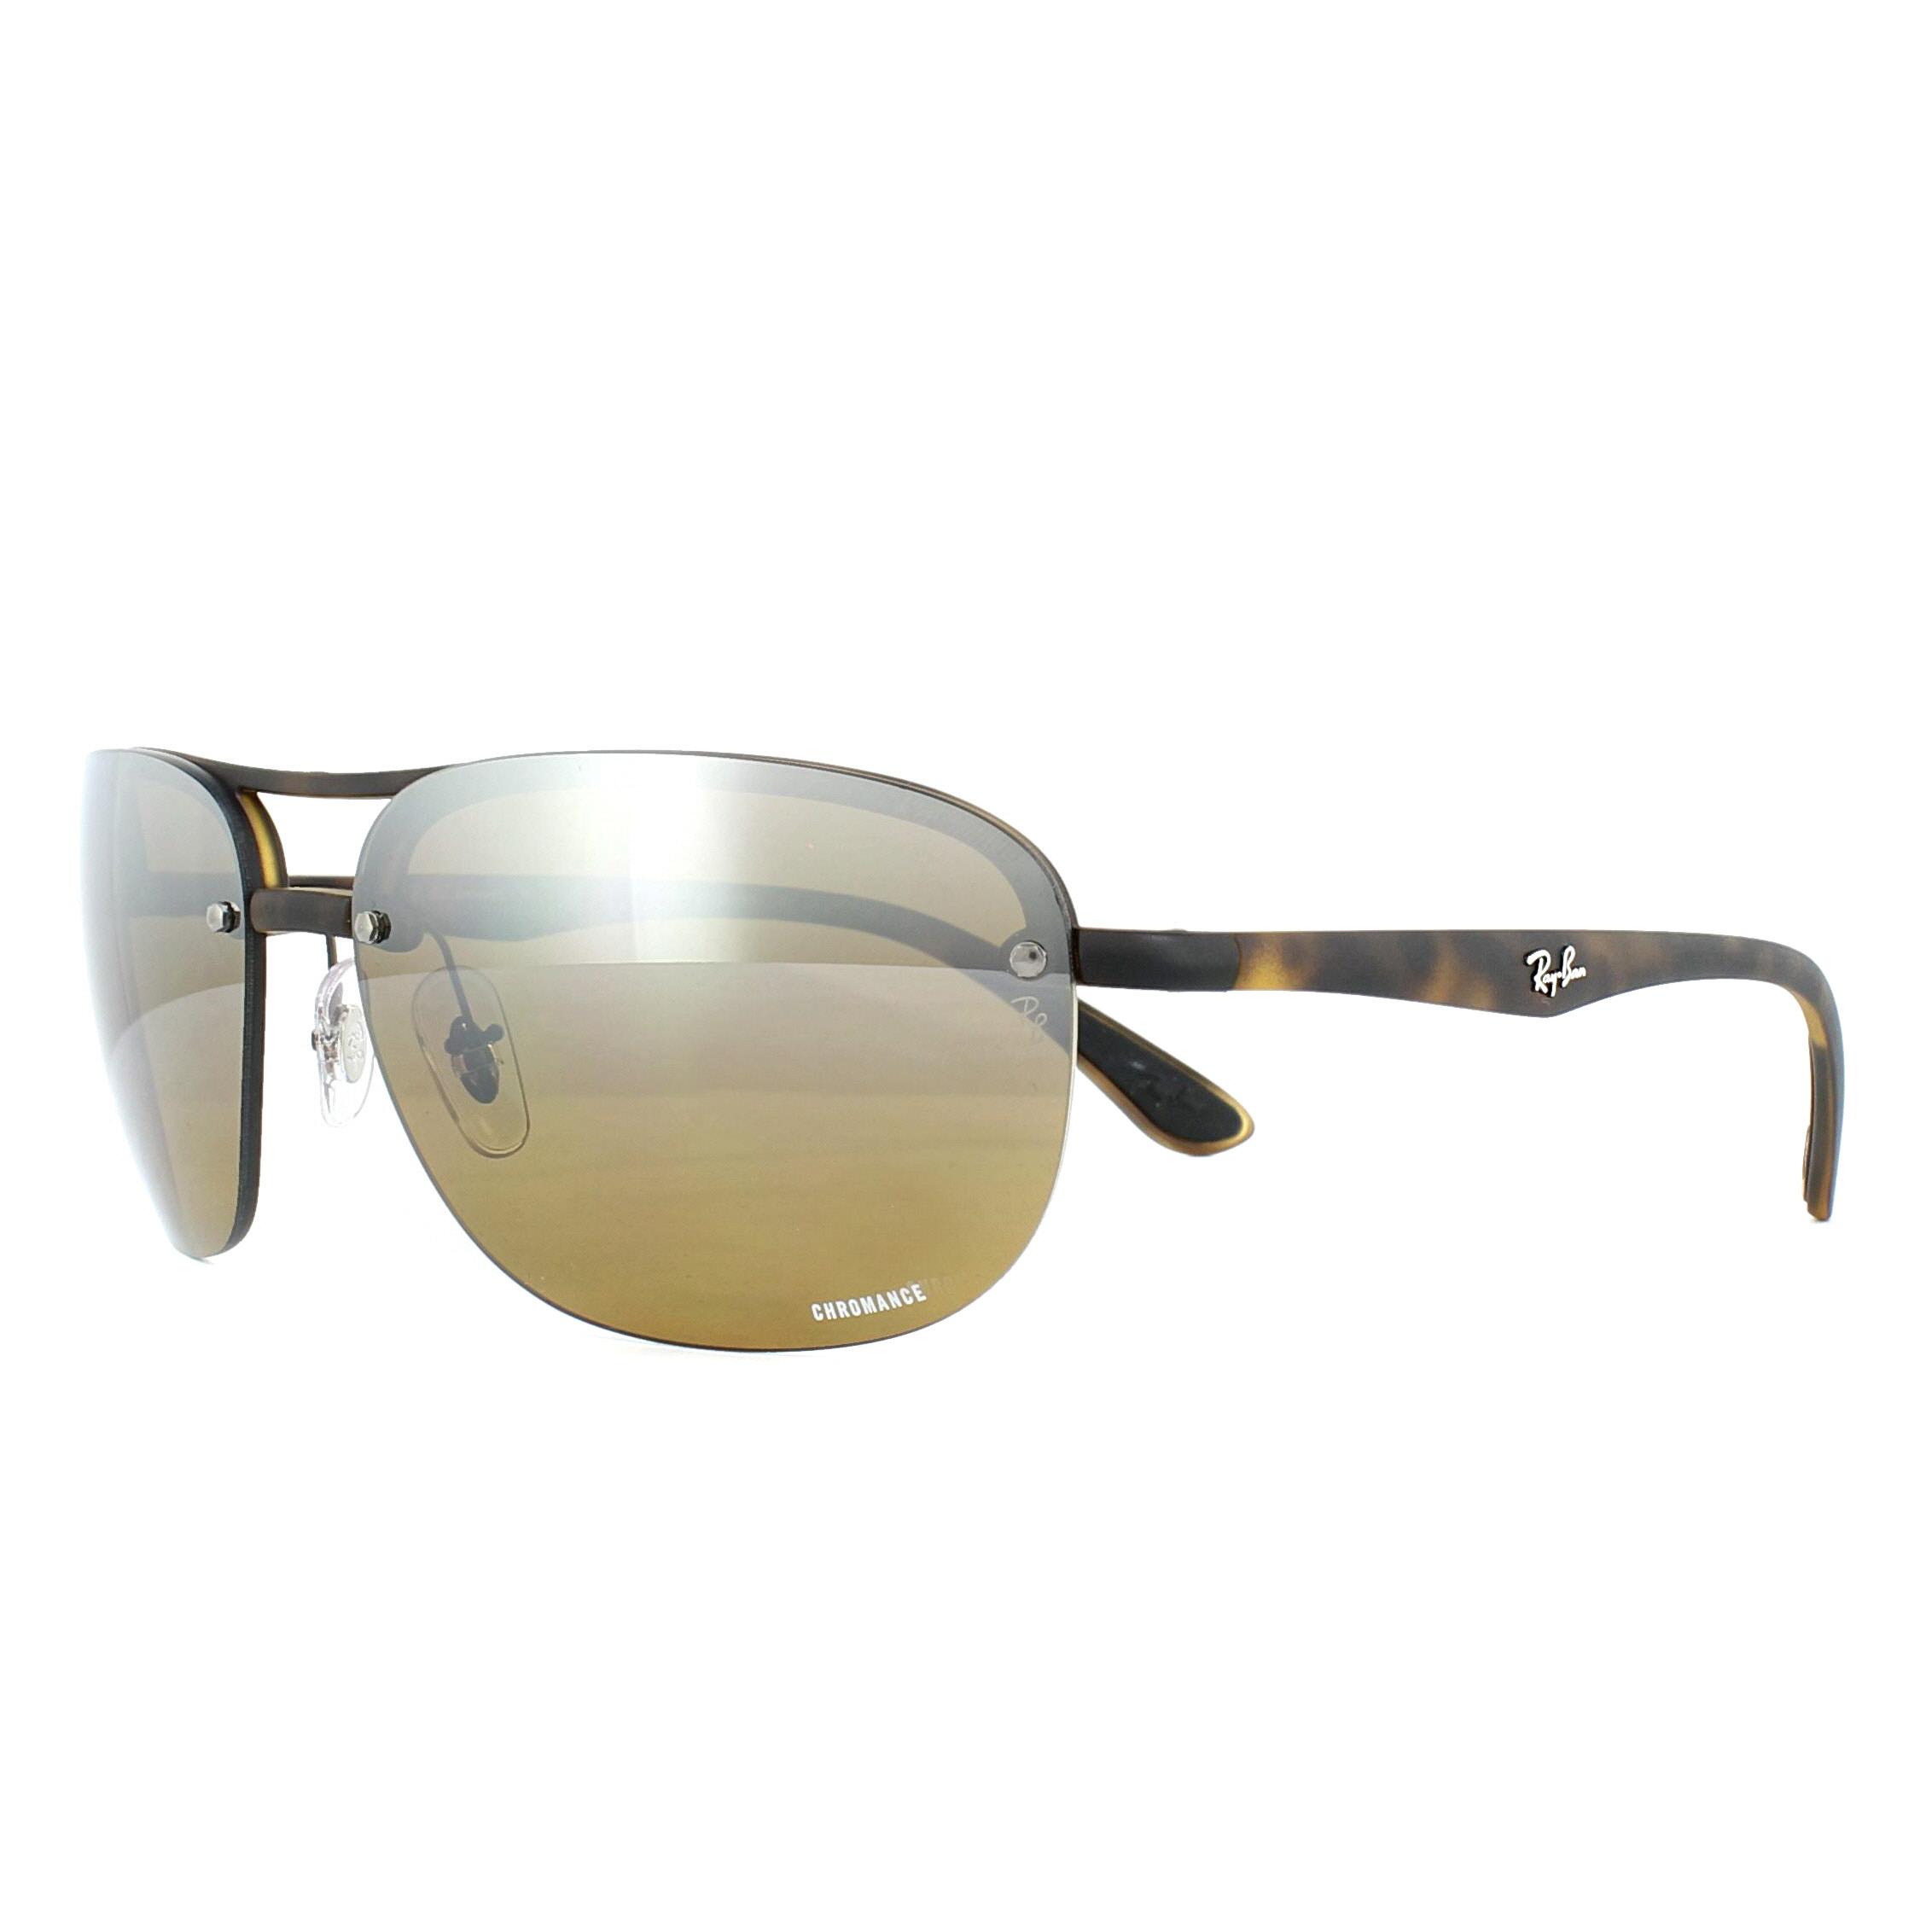 c3ac2a9779 Sentinel Ray-Ban Sunglasses RB4275CH 894 A2 Tortoise Brown Mirror Polarized  Chromance